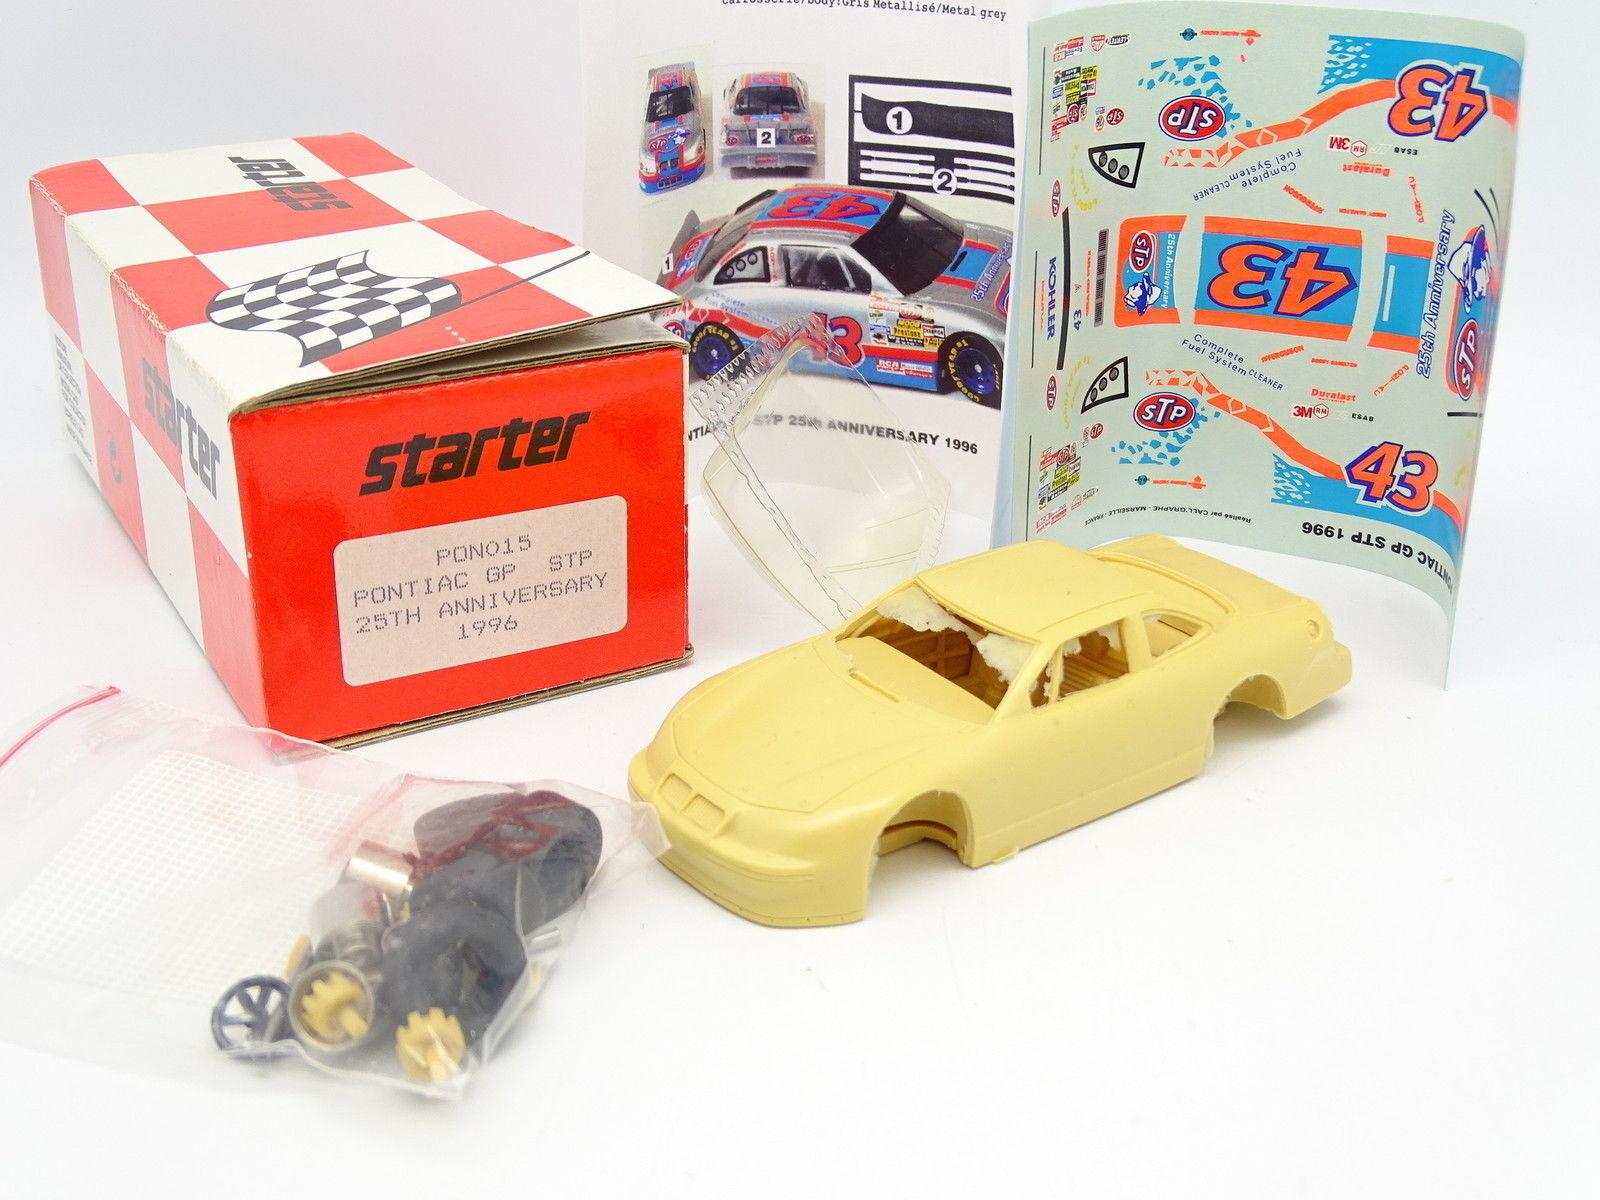 Starter Kit à Monter 1 43 - Pontiac Grand Prix STP 25th Anniversary Nascar 1996